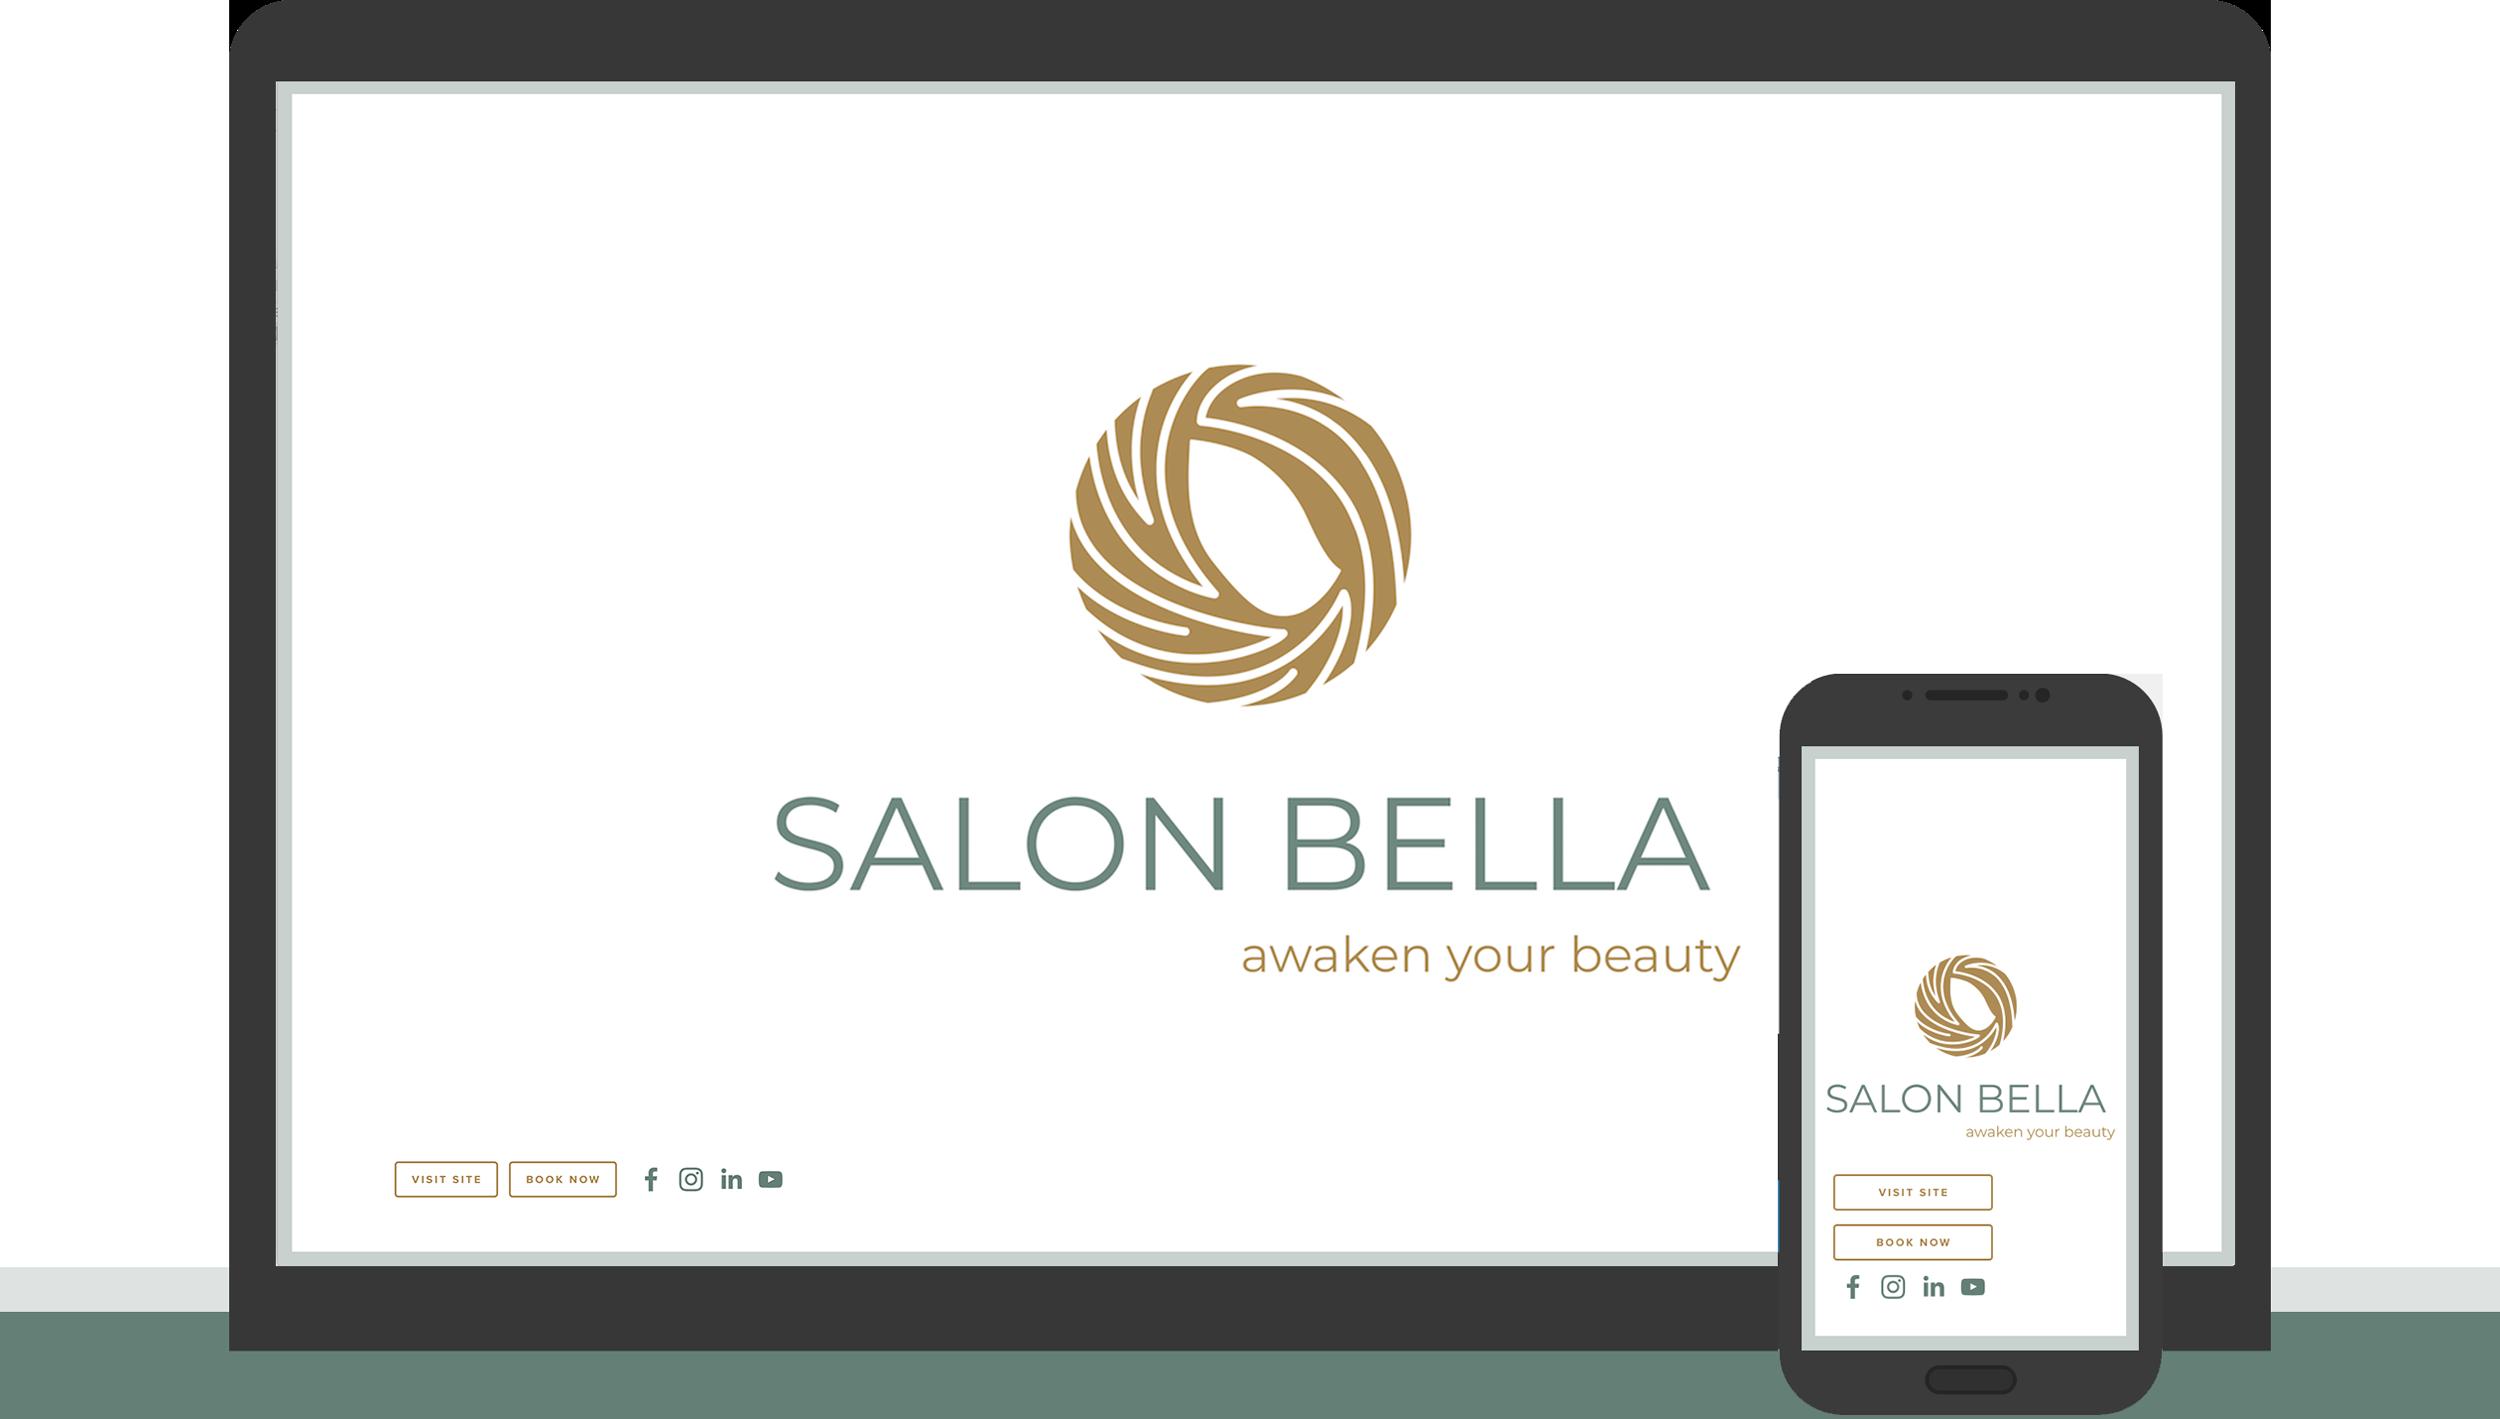 New Website Chelsie Perkins Makeup Artist Talmadge Hickman Master Hair Stylist Chelsie Perkins Stylist Colorist Owners Salon Bella Beauty Salon Whidbey Langley Haircut Hair Color